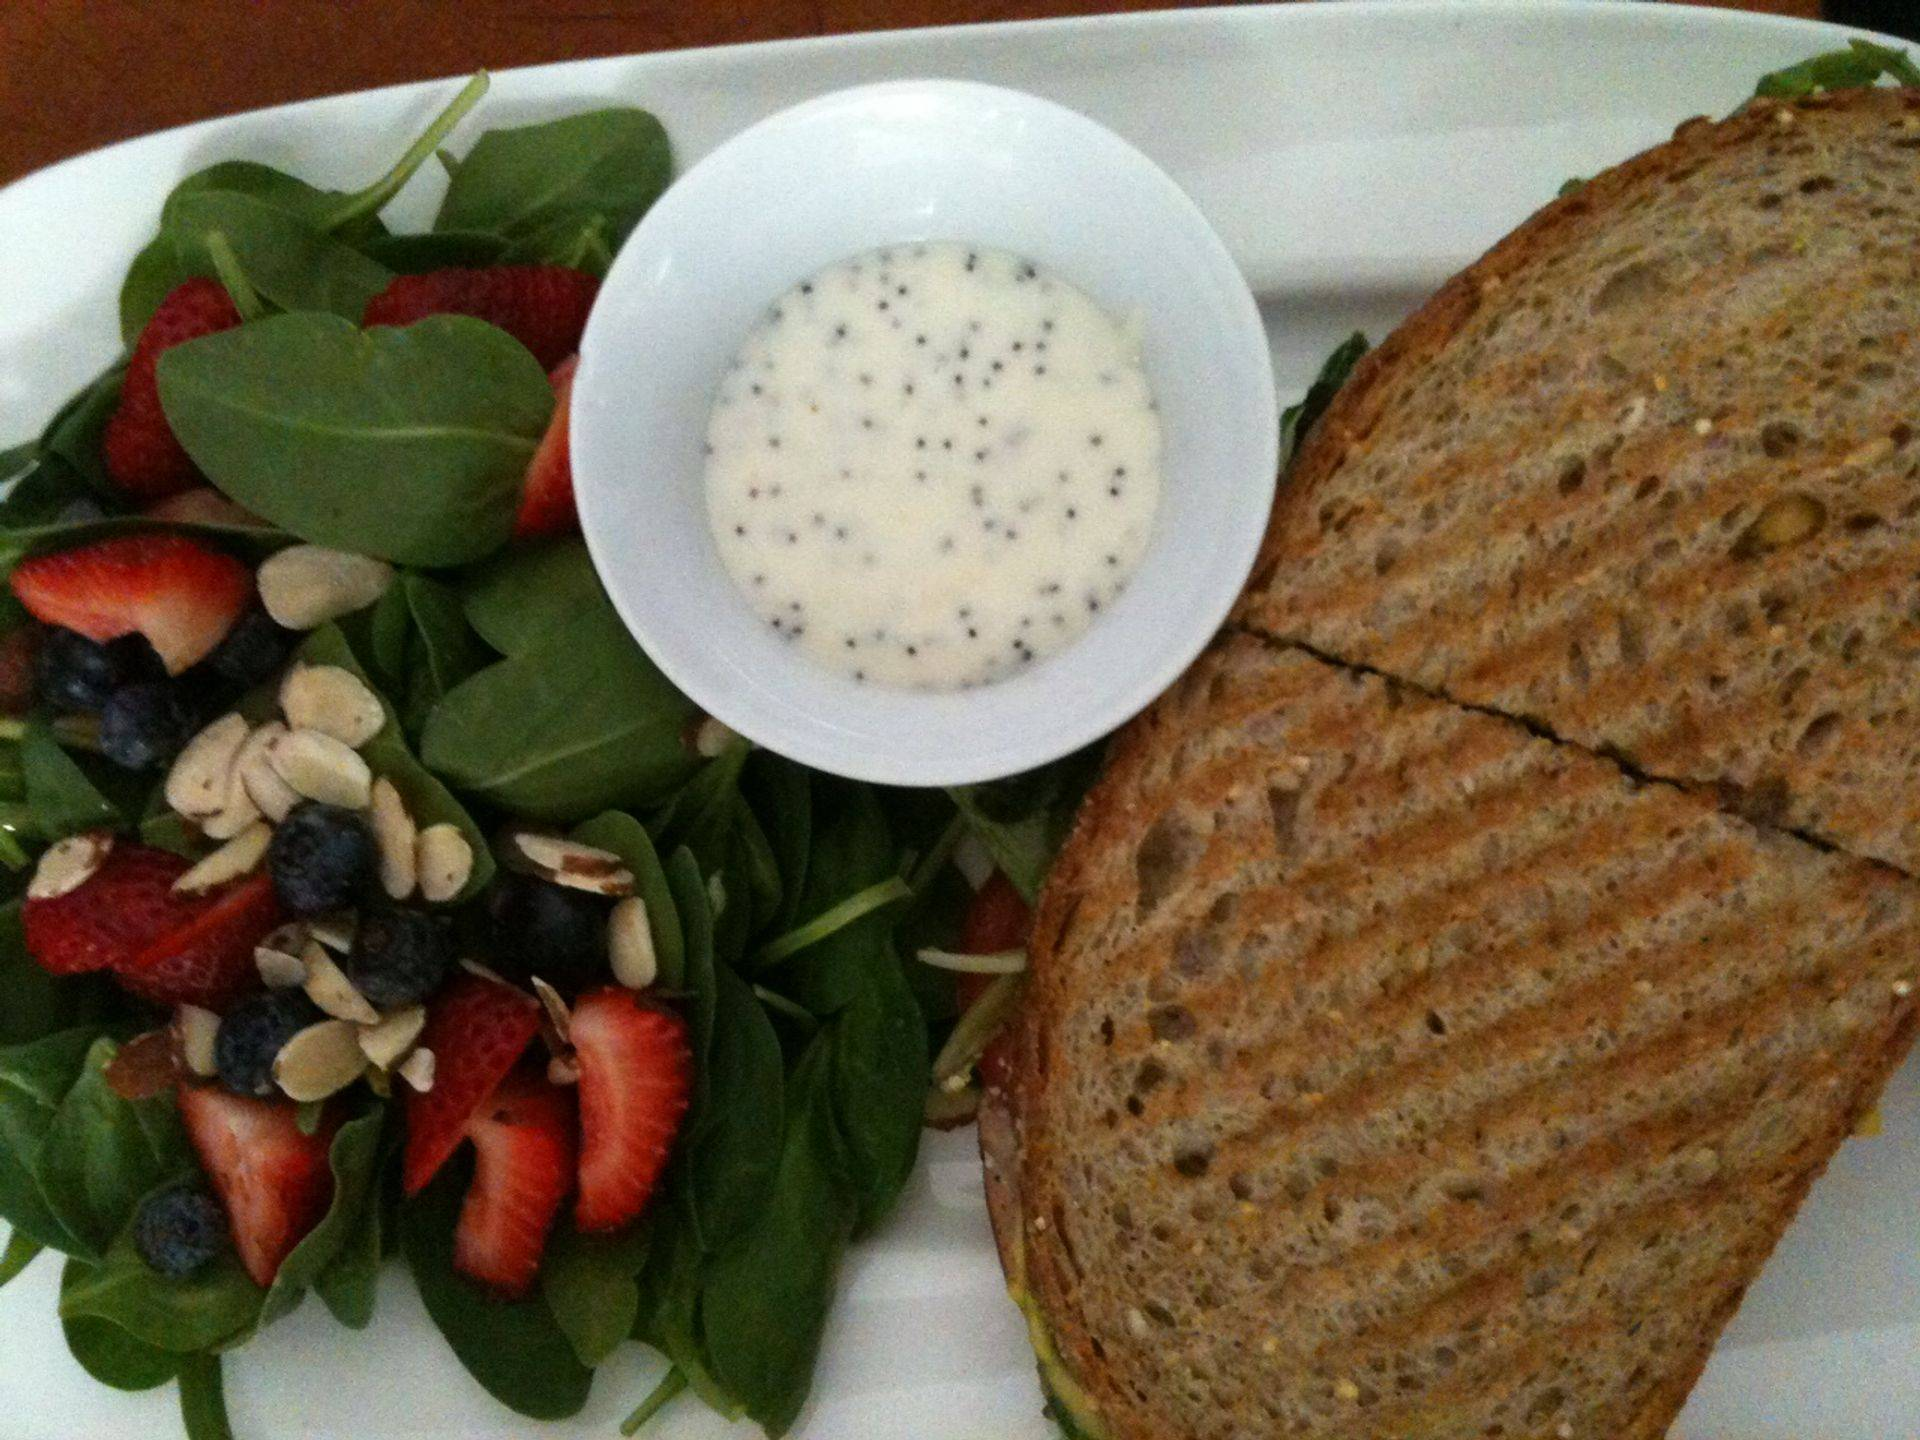 Katy & Northwoods salad